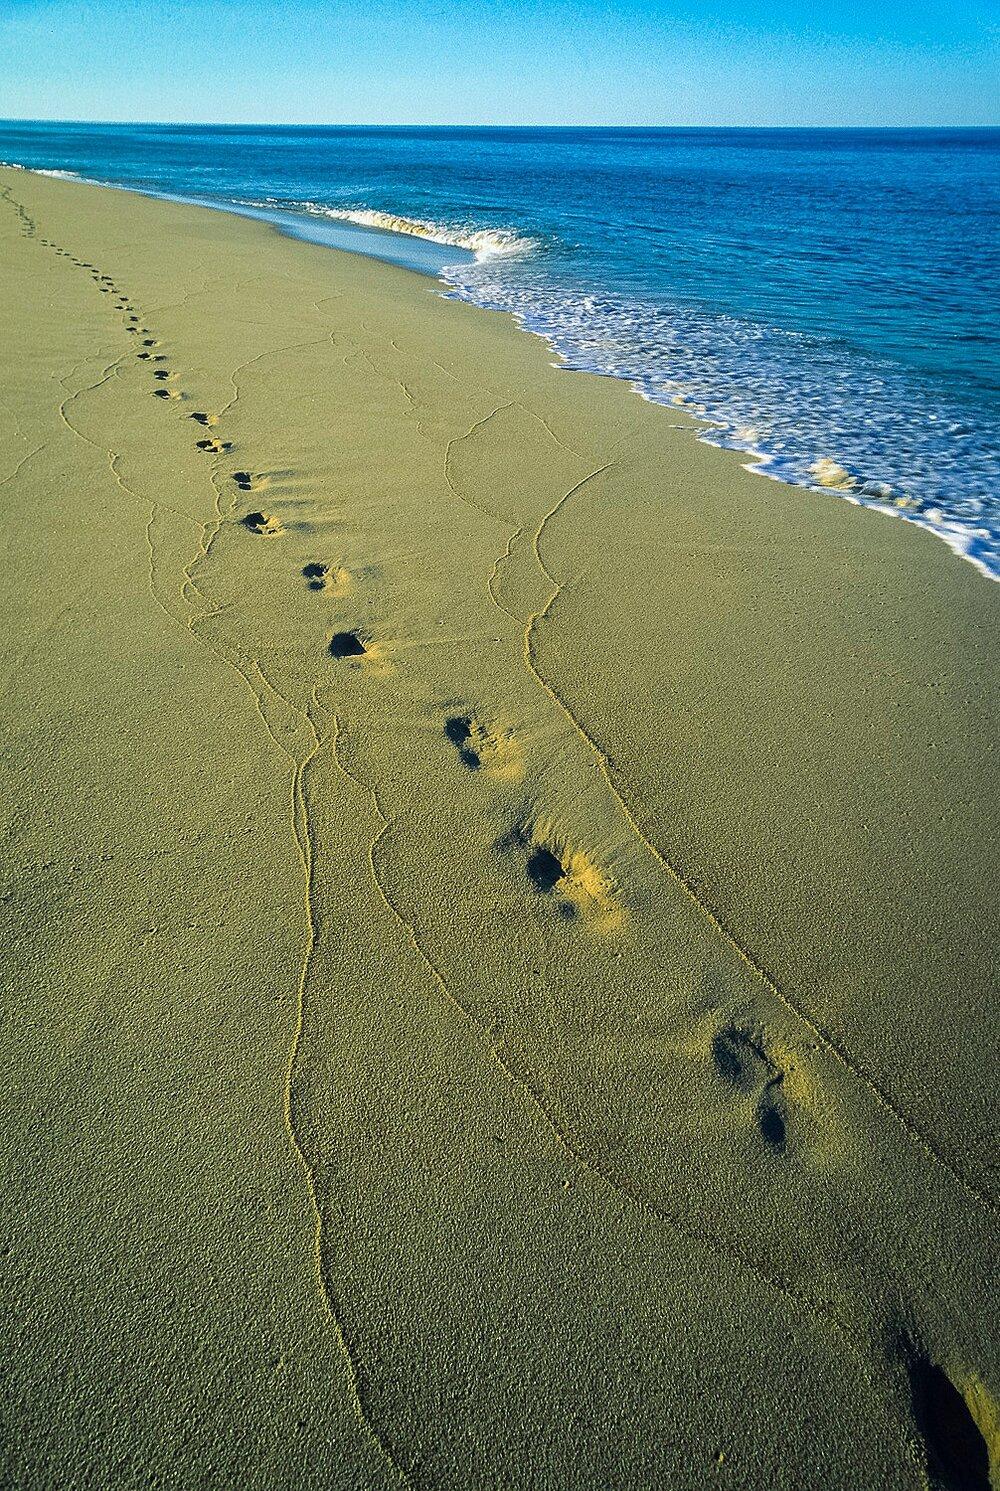 Leave Only Footprints - Cape Cod National Seashore, Massachusetts